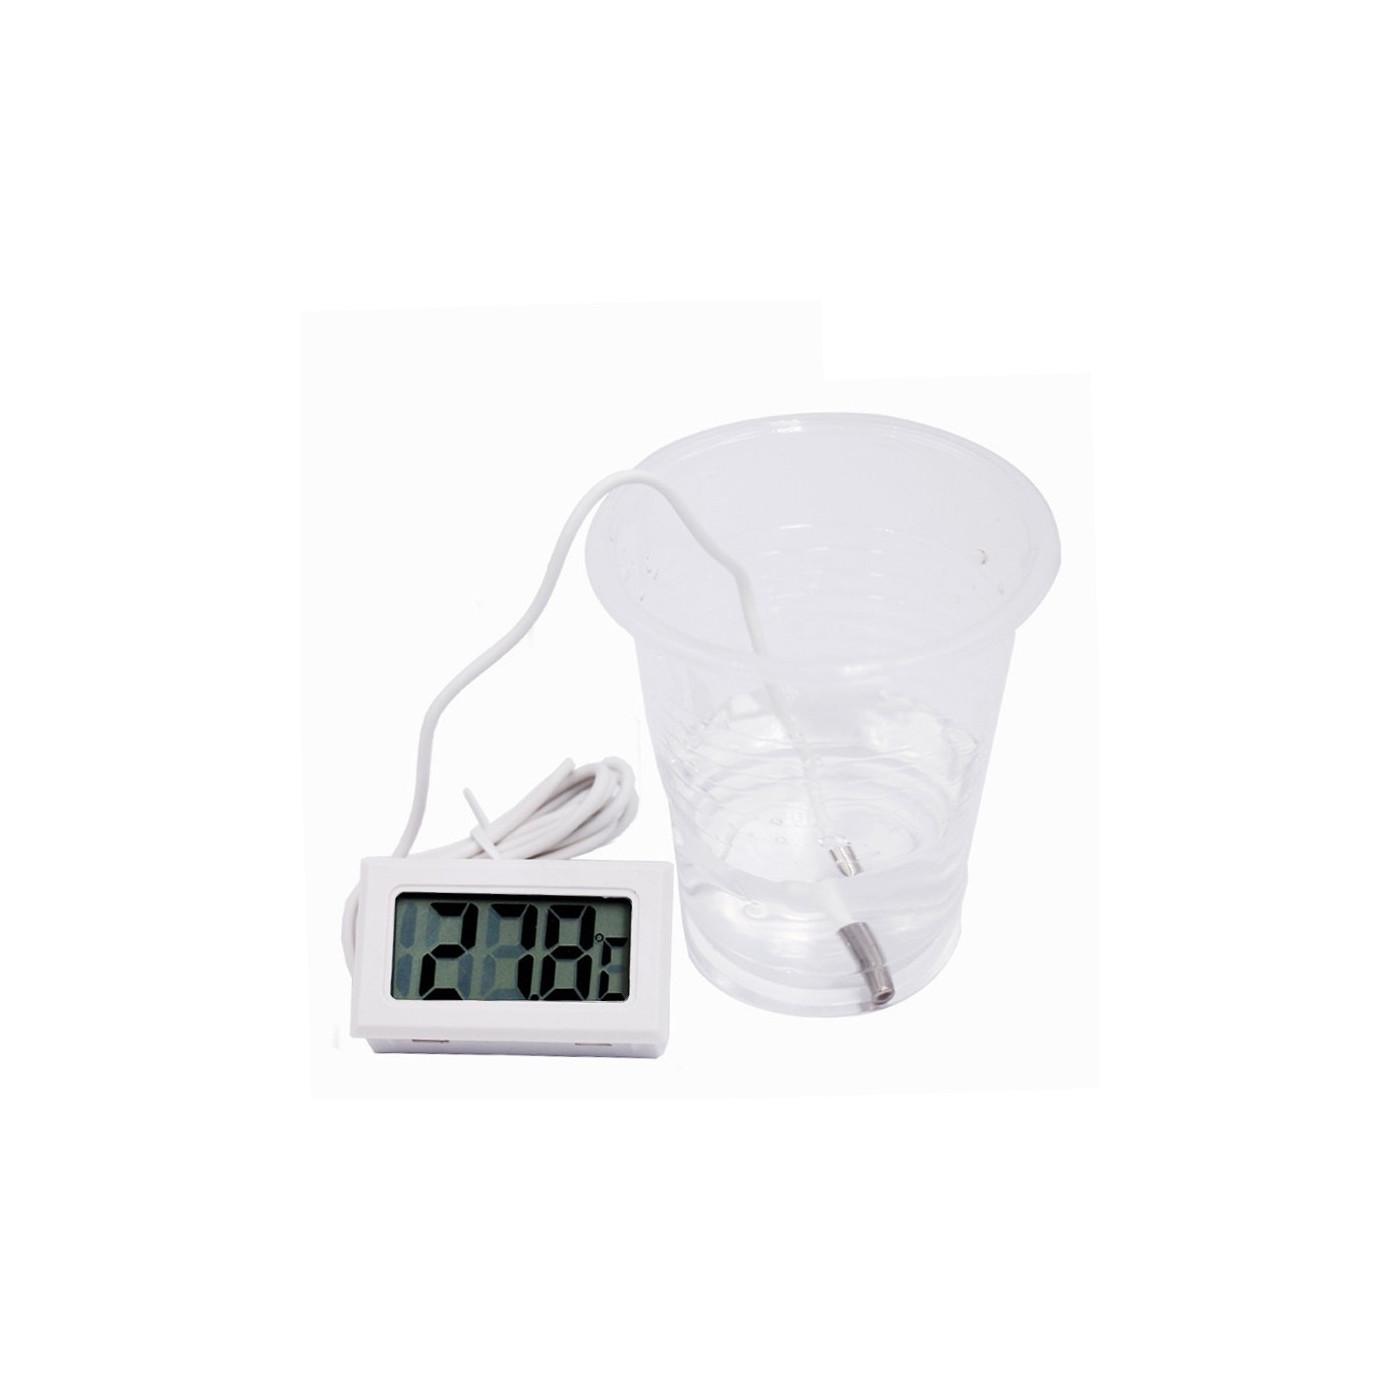 Termómetro LCD blanco con sonda (para acuarios, etc.)  - 1